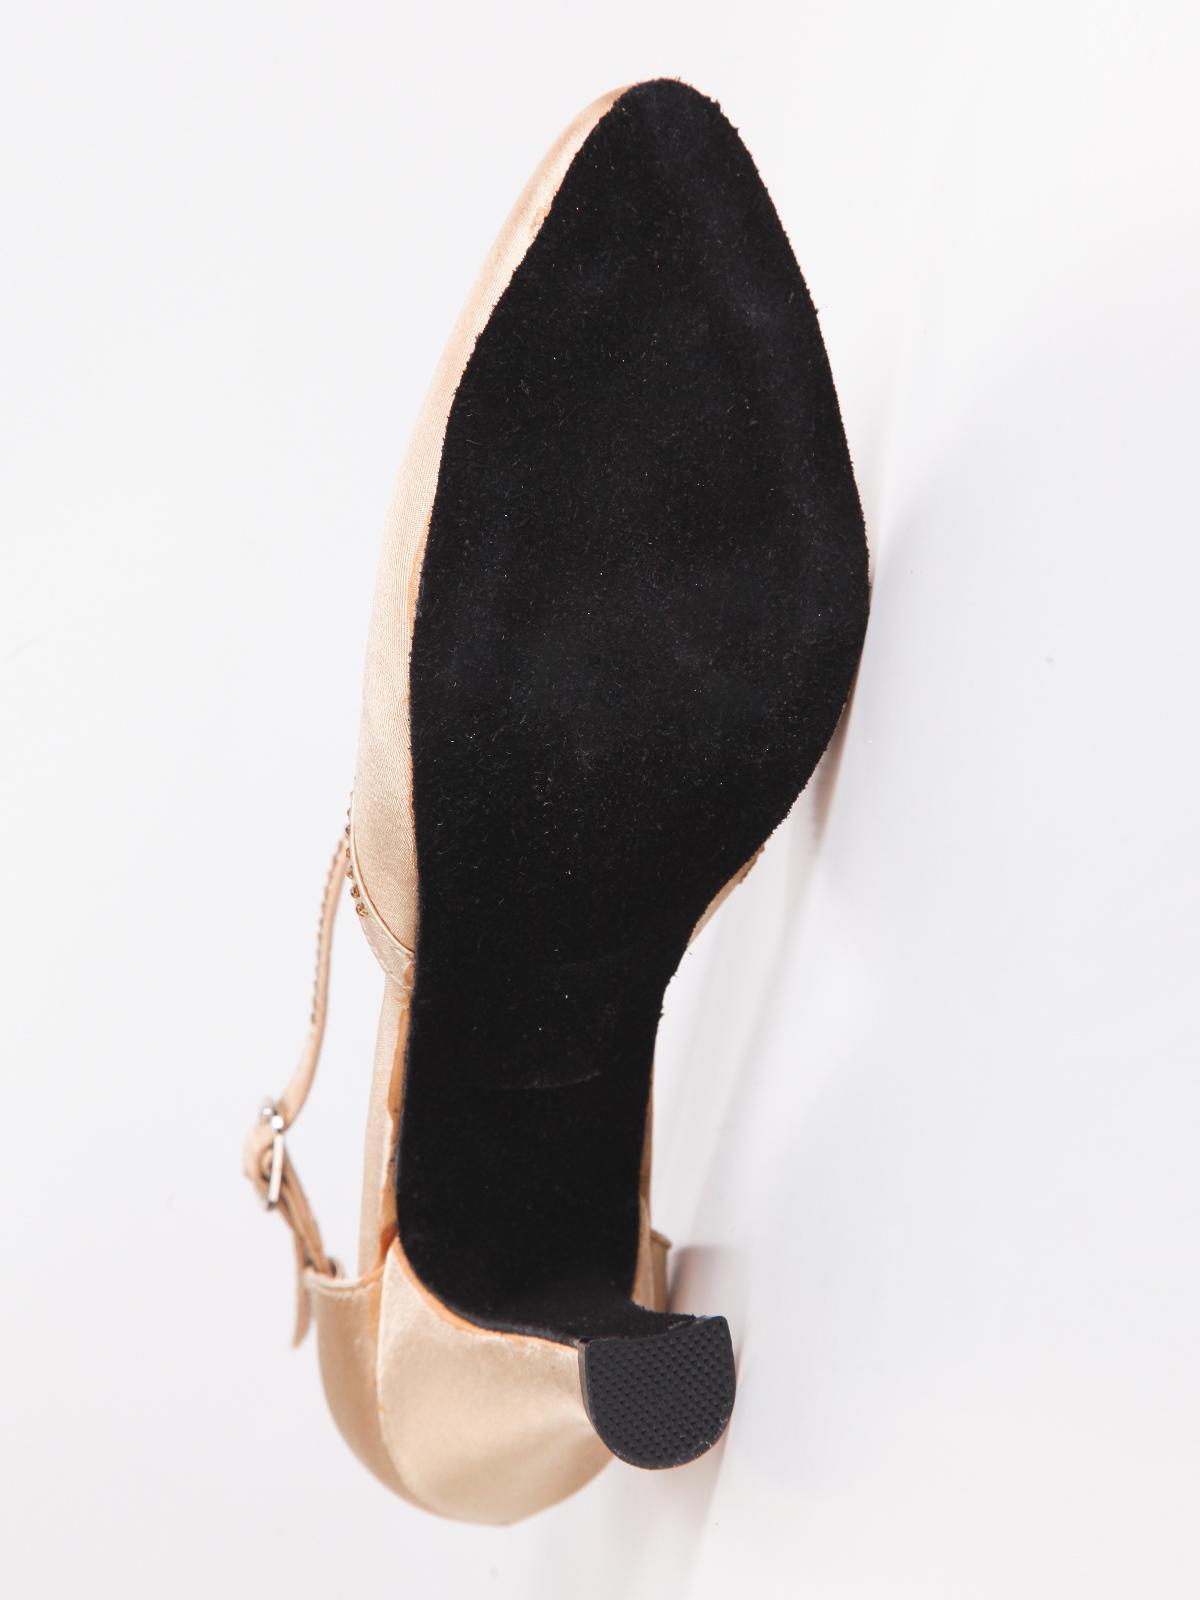 half off 018f1 b25c7 queen helena Shoes Ballroom | MecShopping